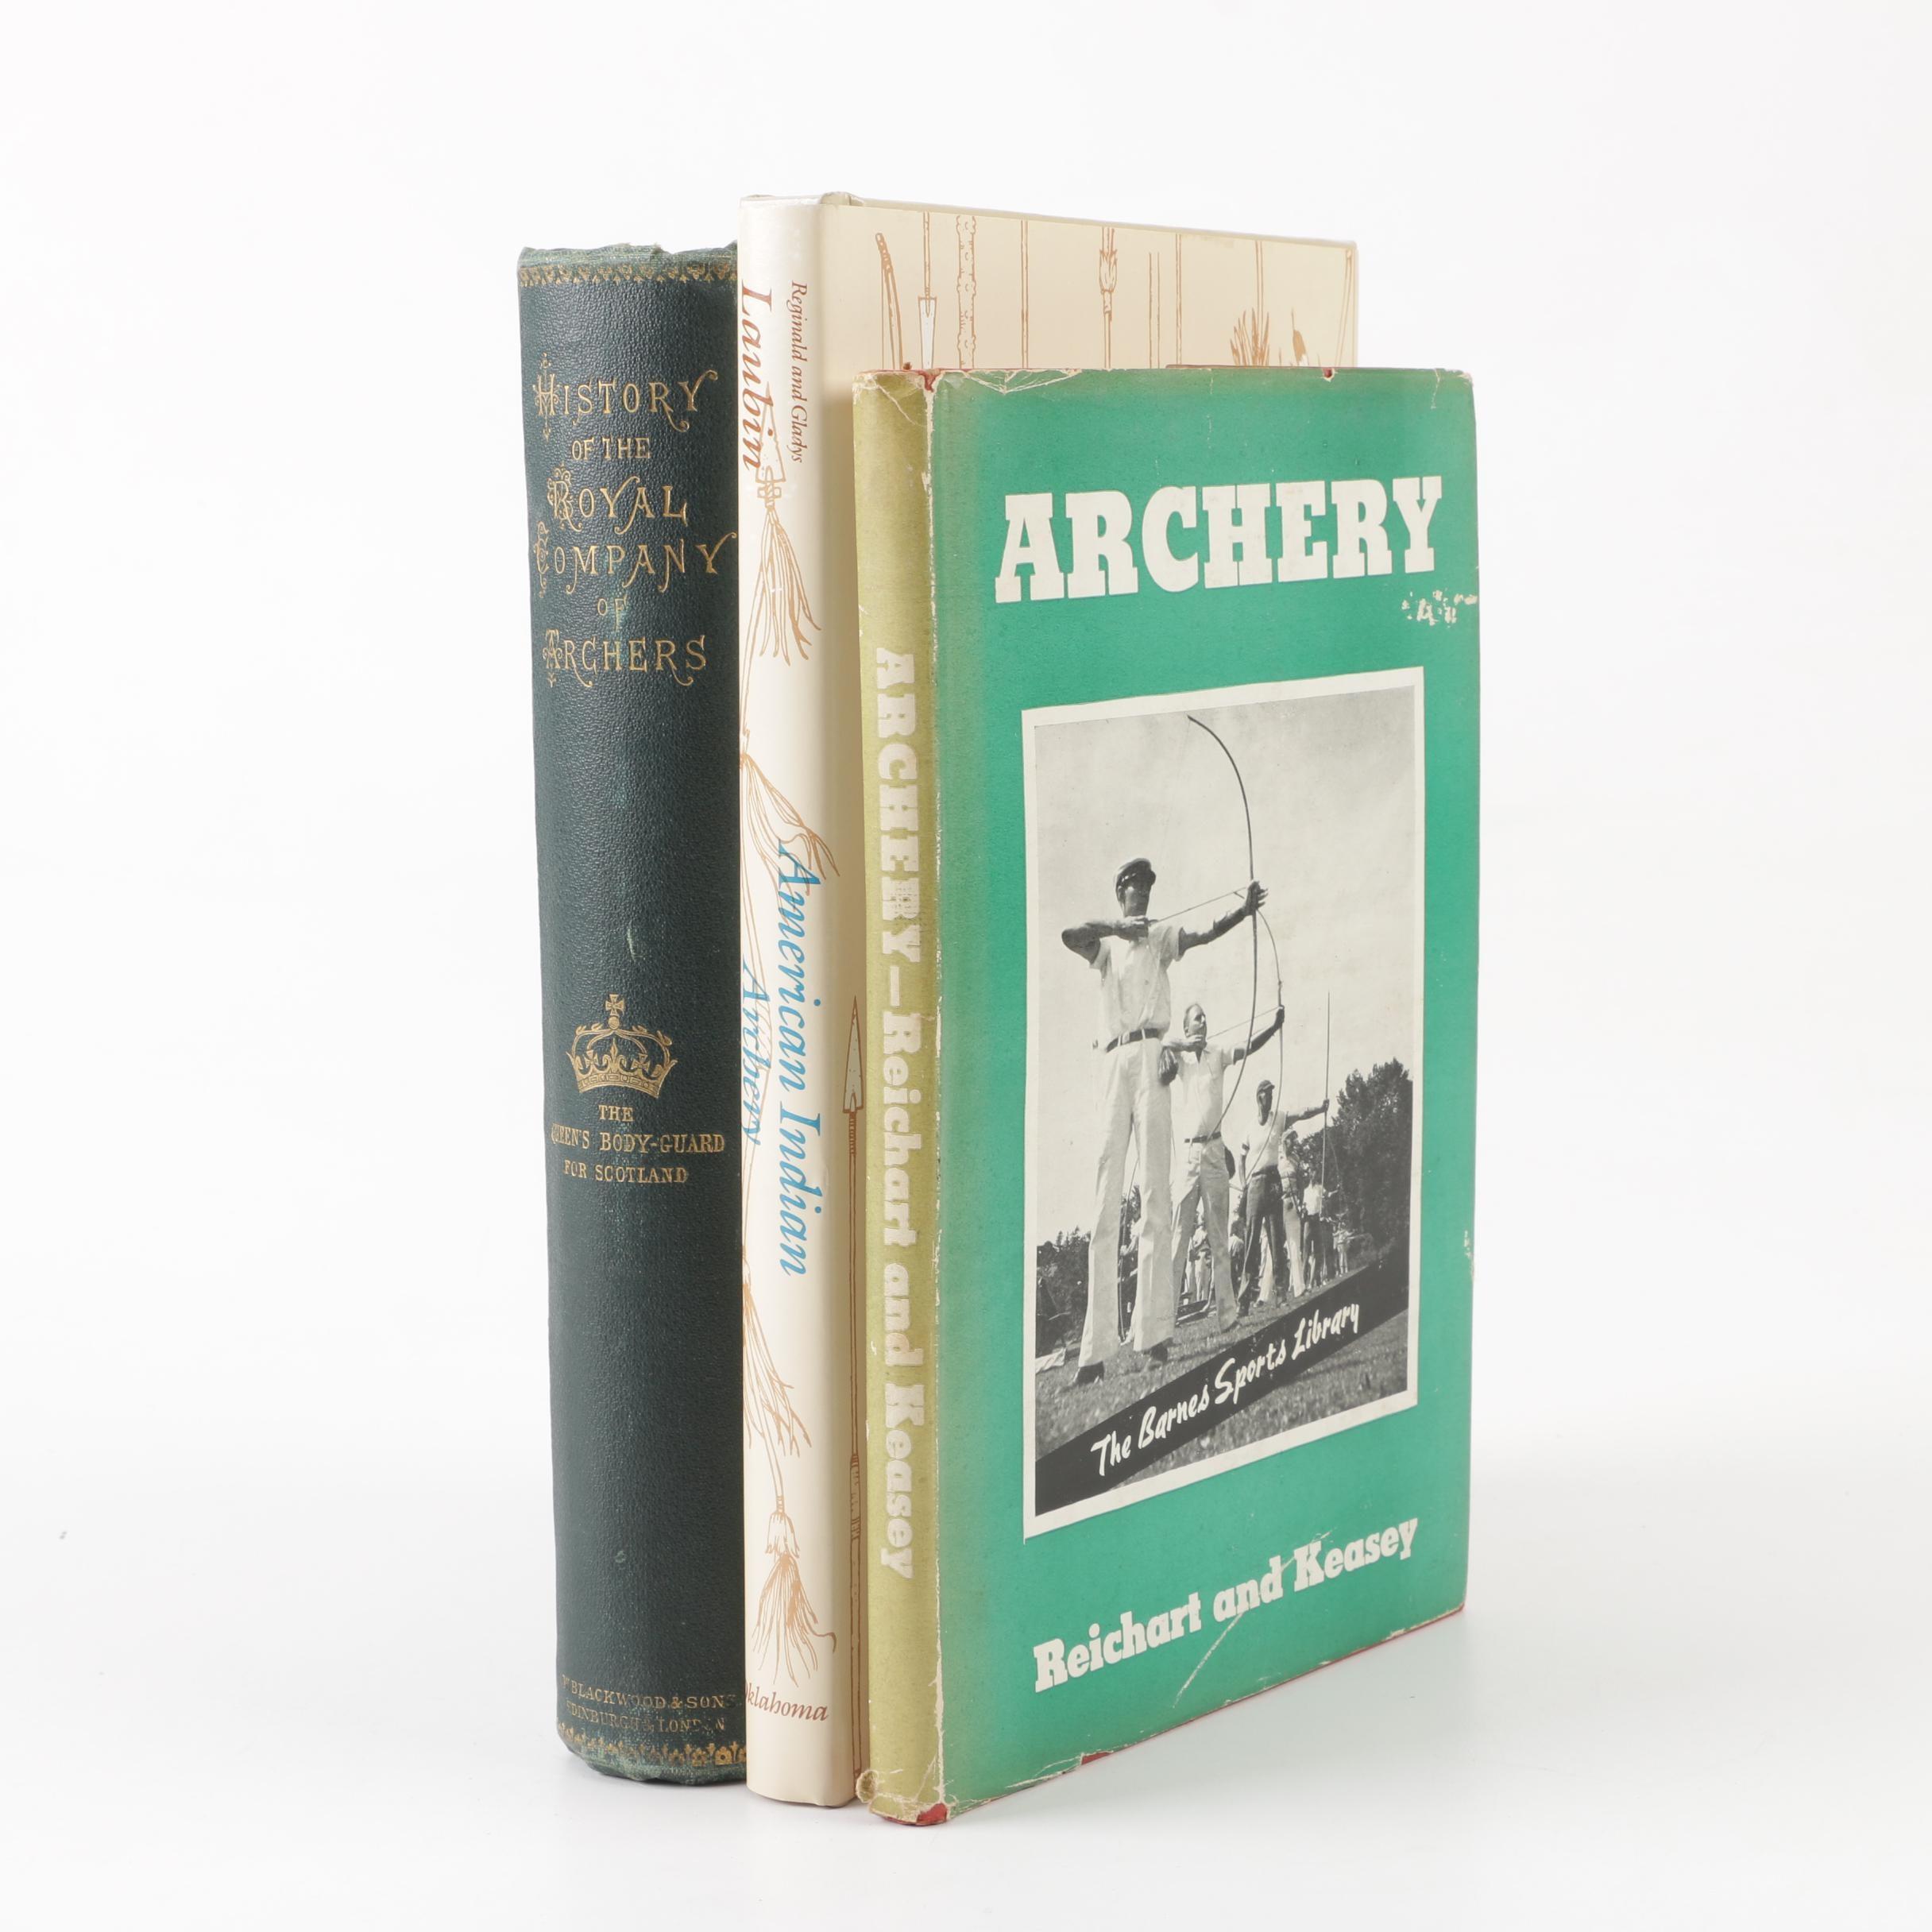 Vintage Archery Books